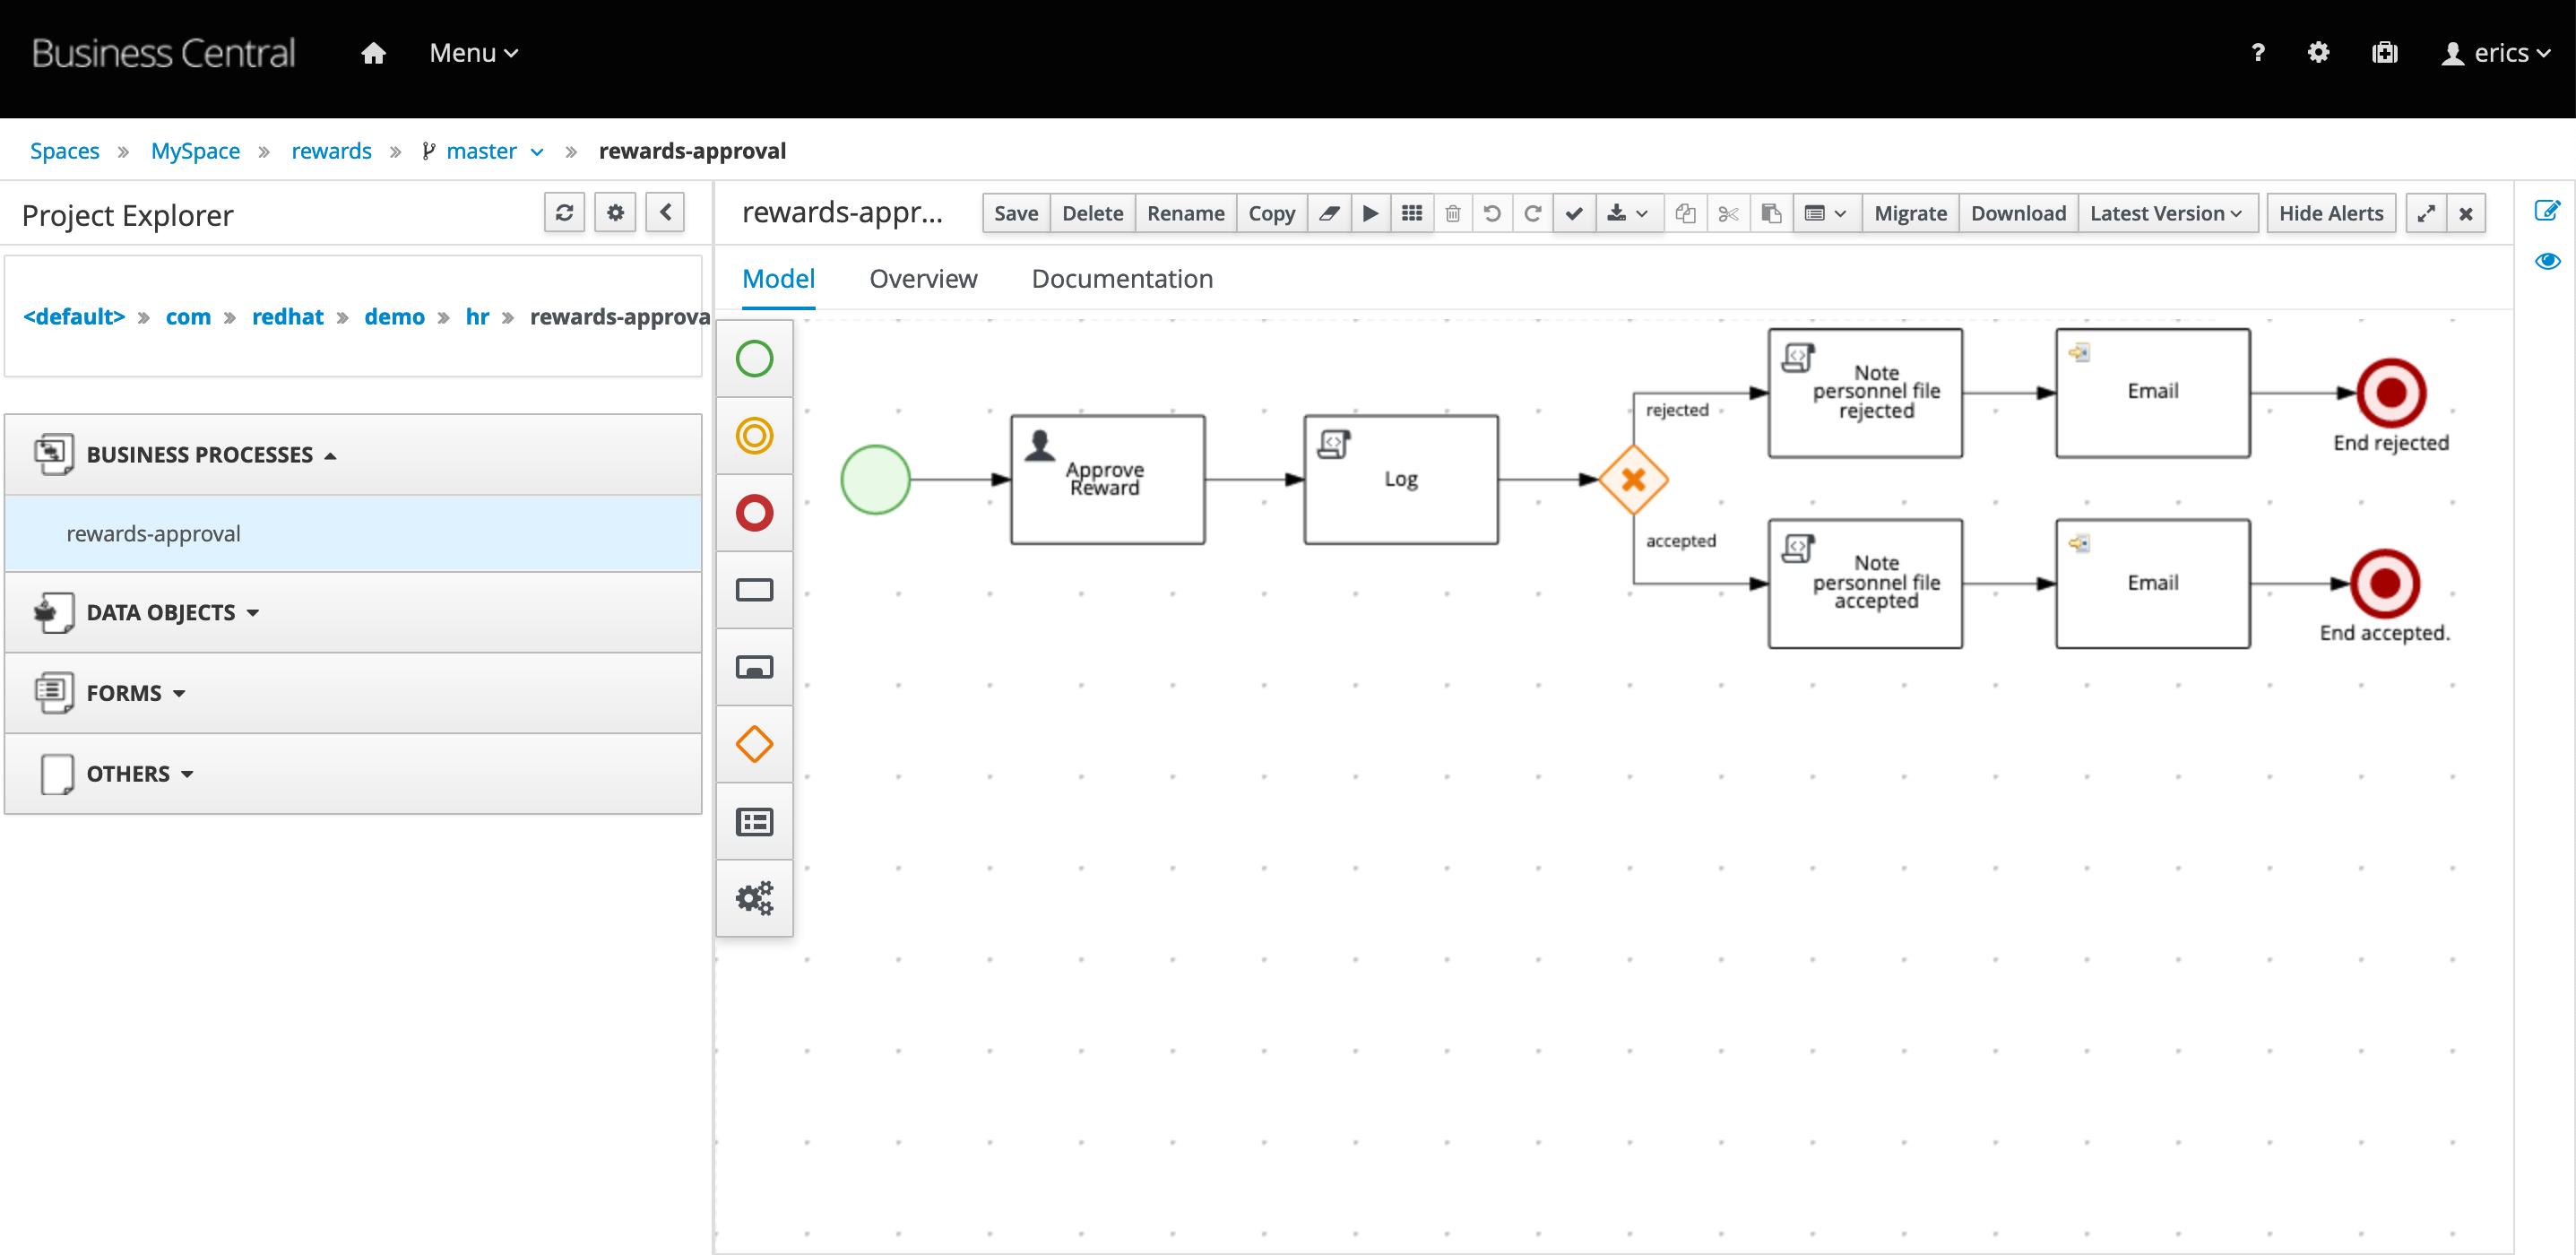 docs/demo-images/process-designer.png